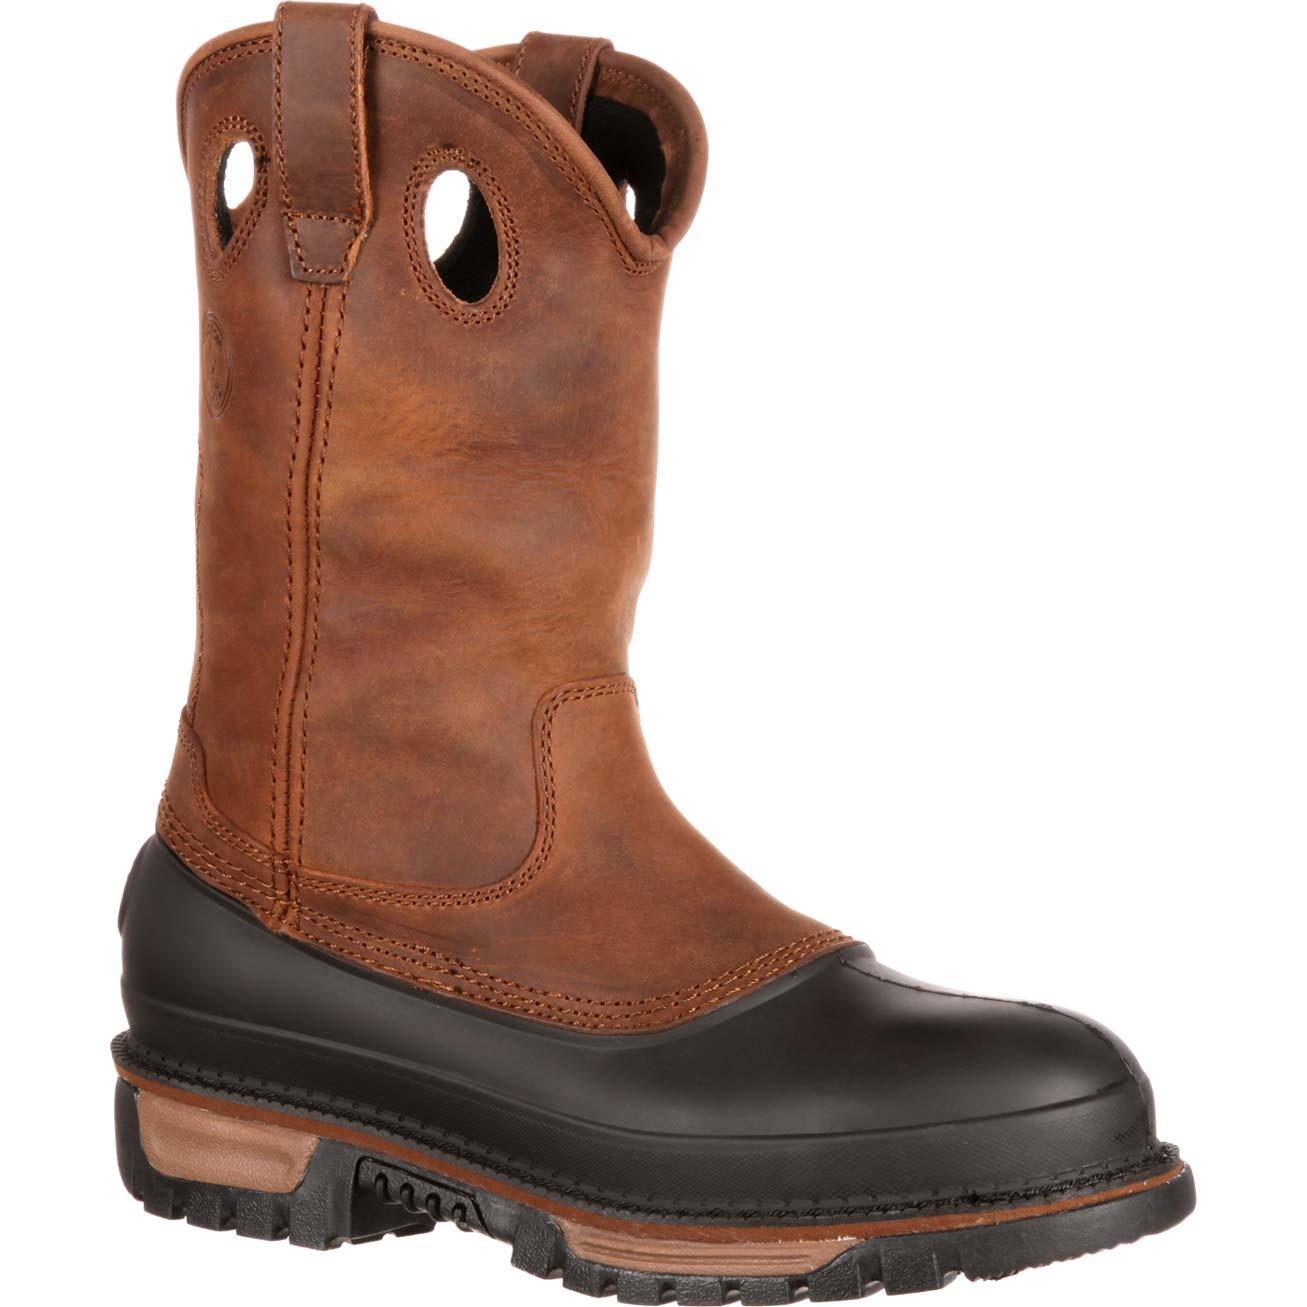 f20ce6dca4e Georgia Boot Muddog Steel Toe Waterproof Wellington